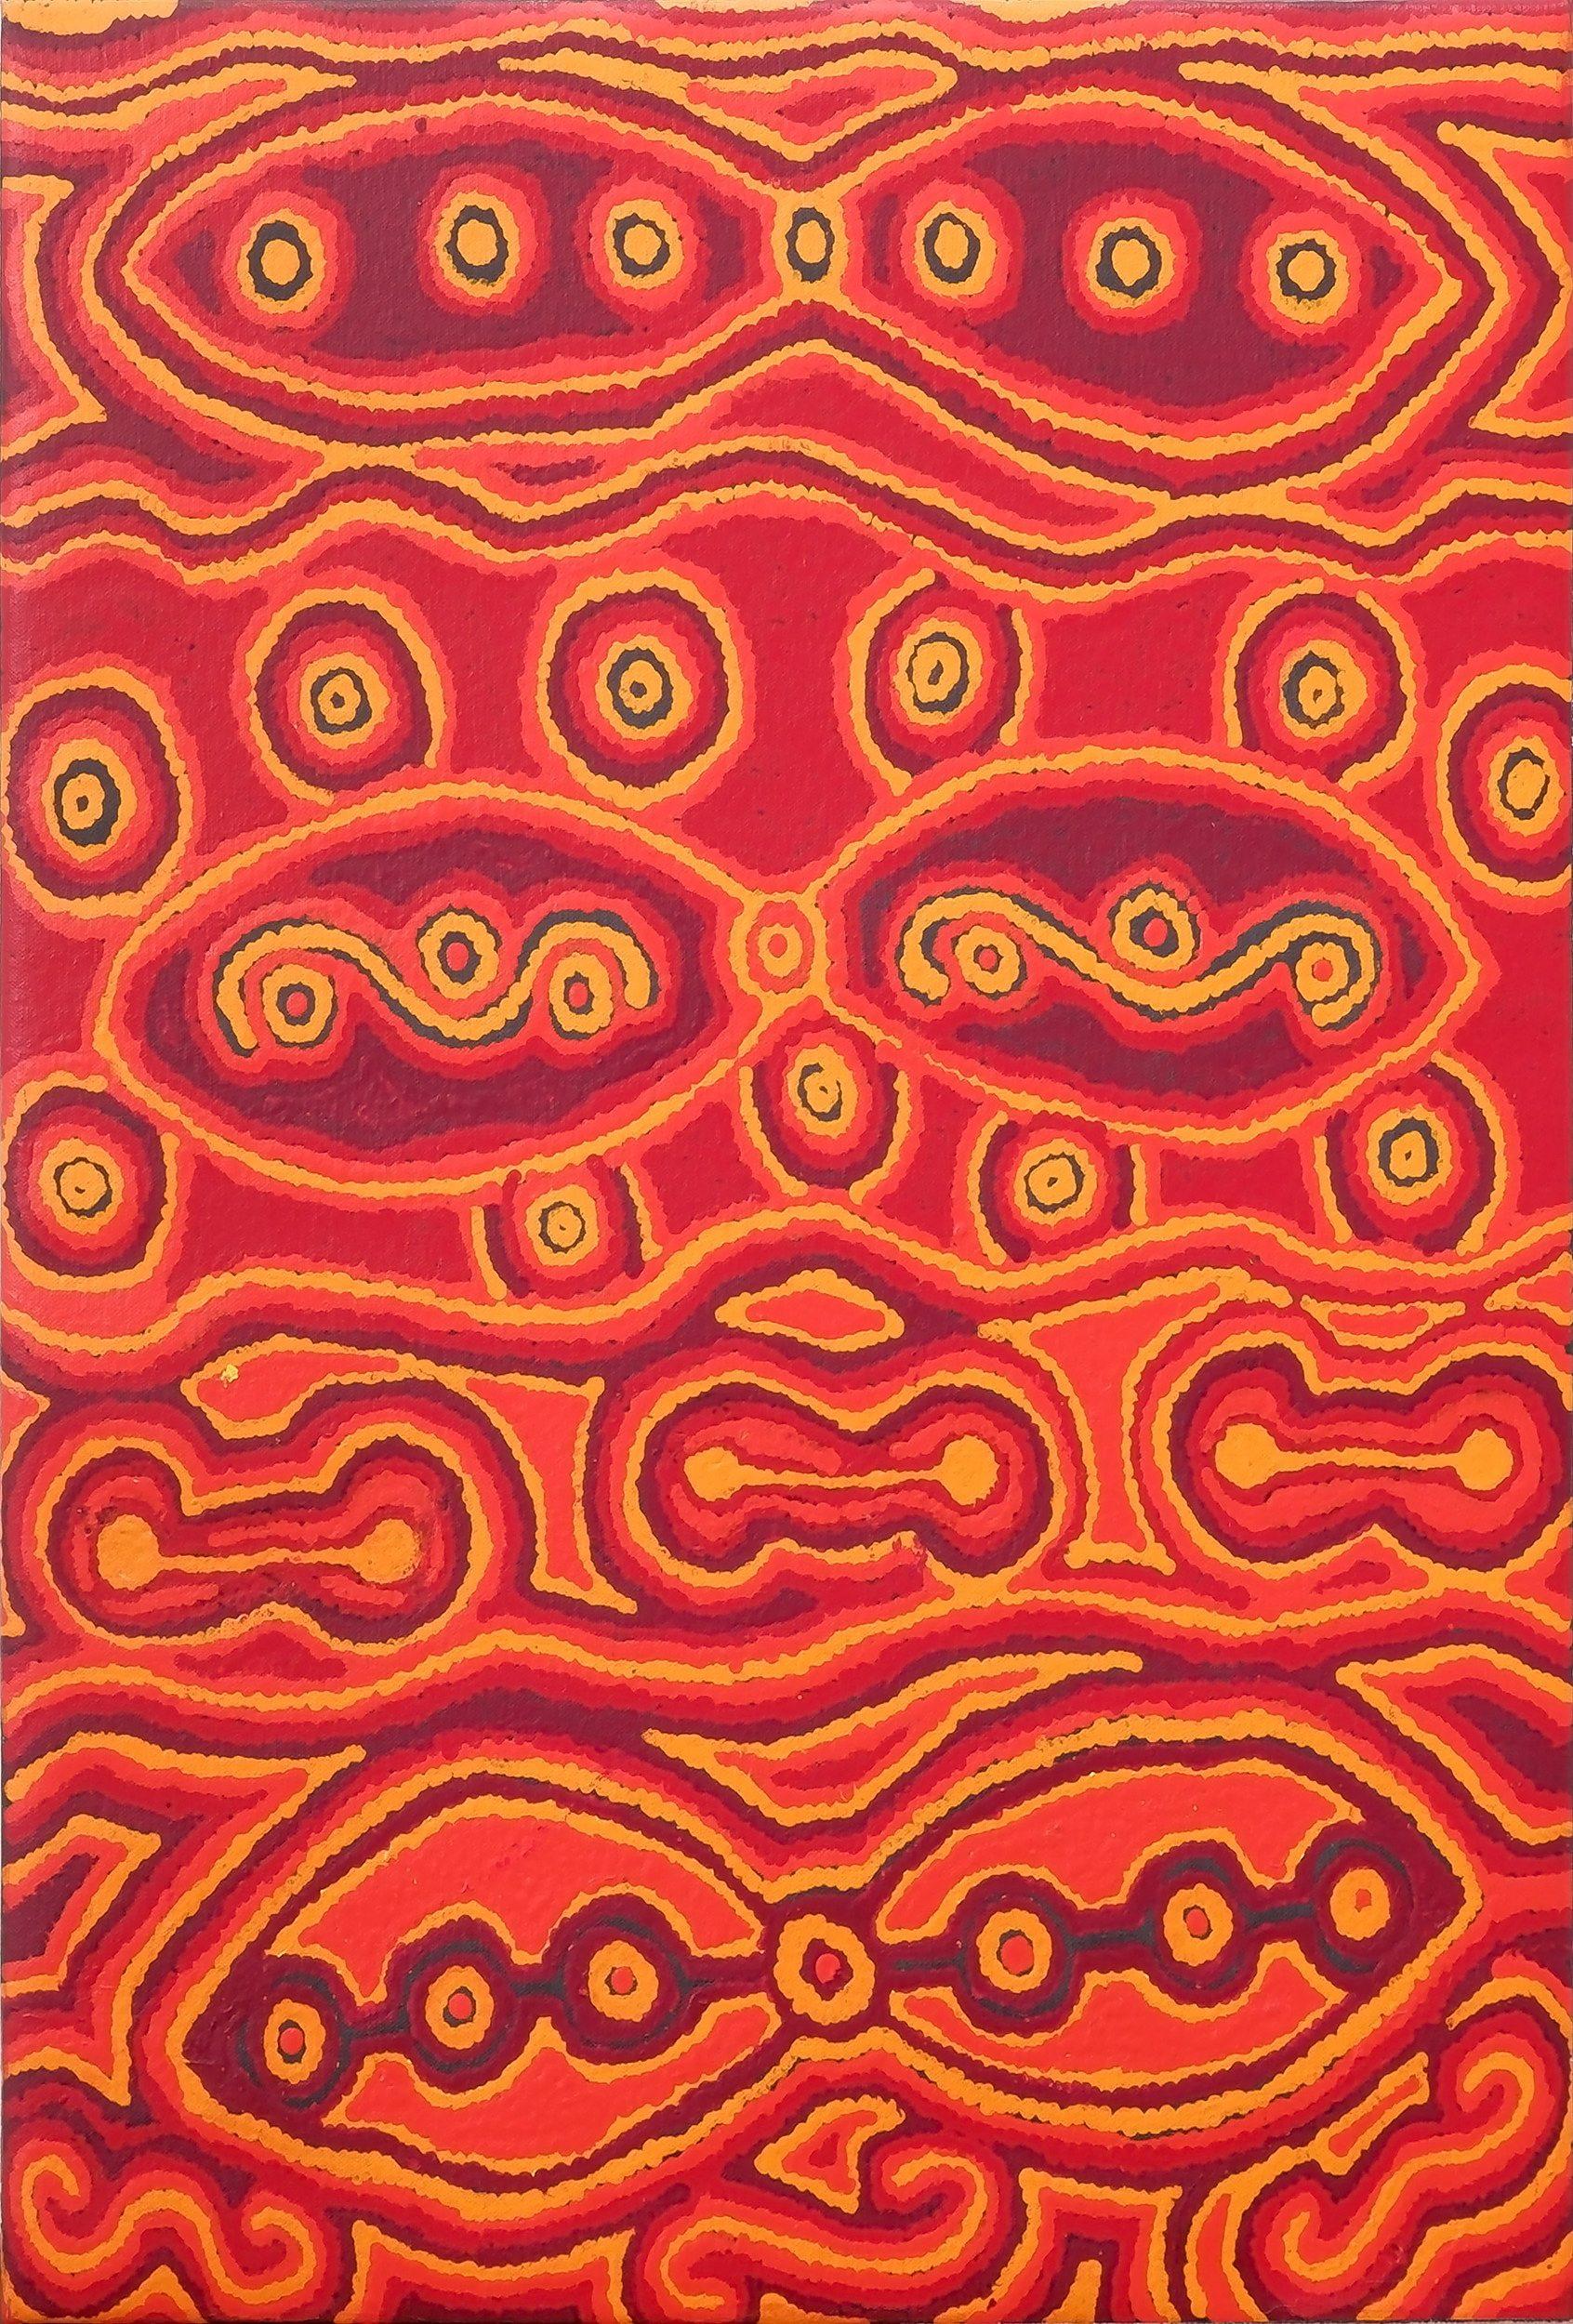 'Teresa Baker (1977-) Kanpi 2007, Acrylic on Canvas'